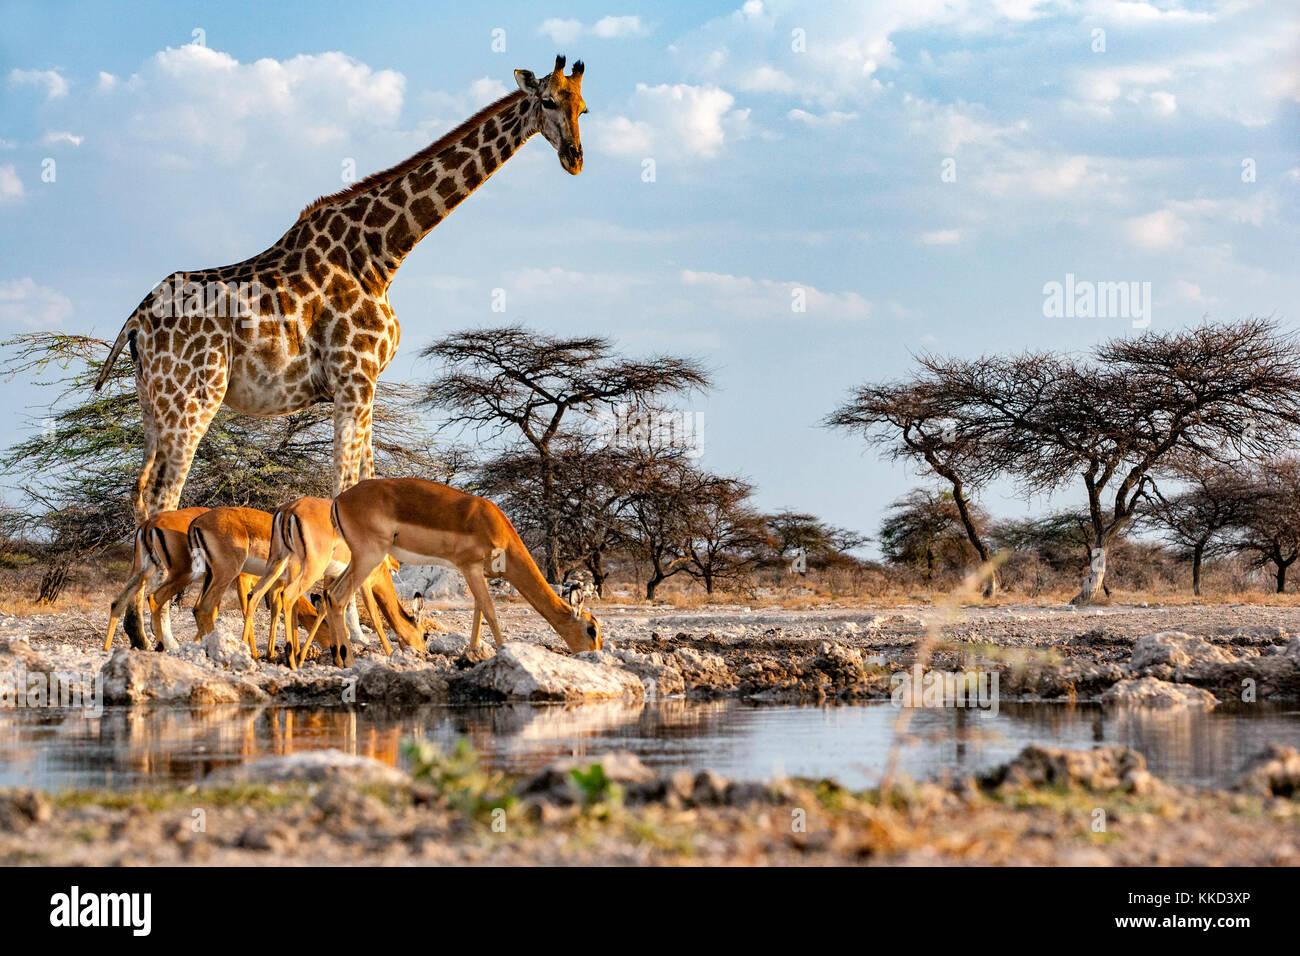 Giraffe with impala at Onkolo Hide, Onguma Game Reserve, Namibia, Africa - Stock Image